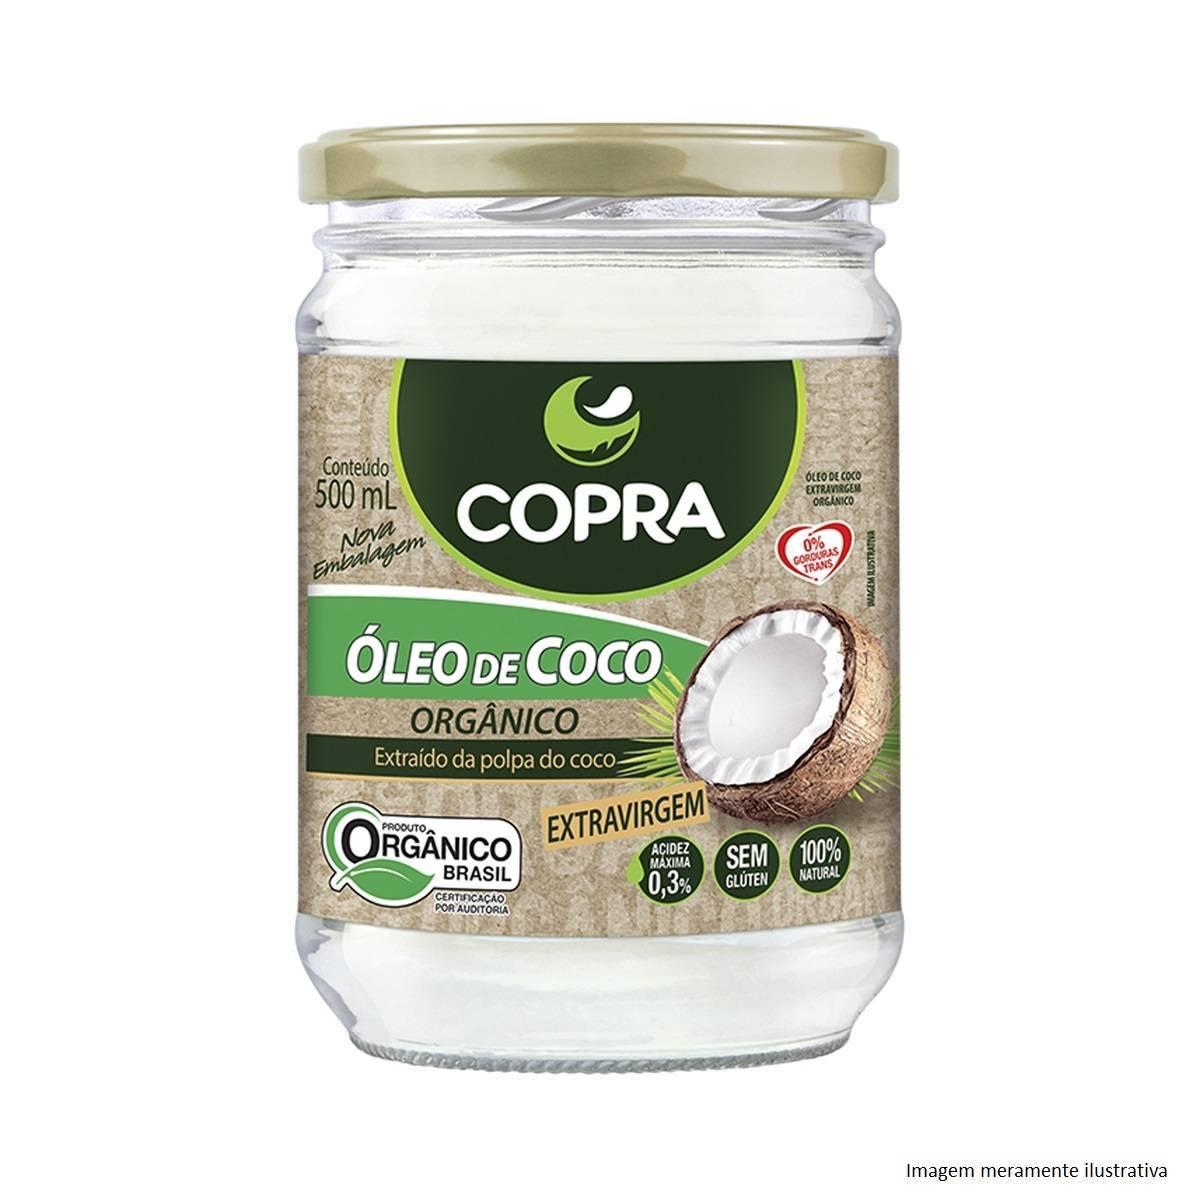 Óleo de Coco Orgânico - Promove Menor Acúmulo de Gorduras no Corpo (500mL) - Tito Farma